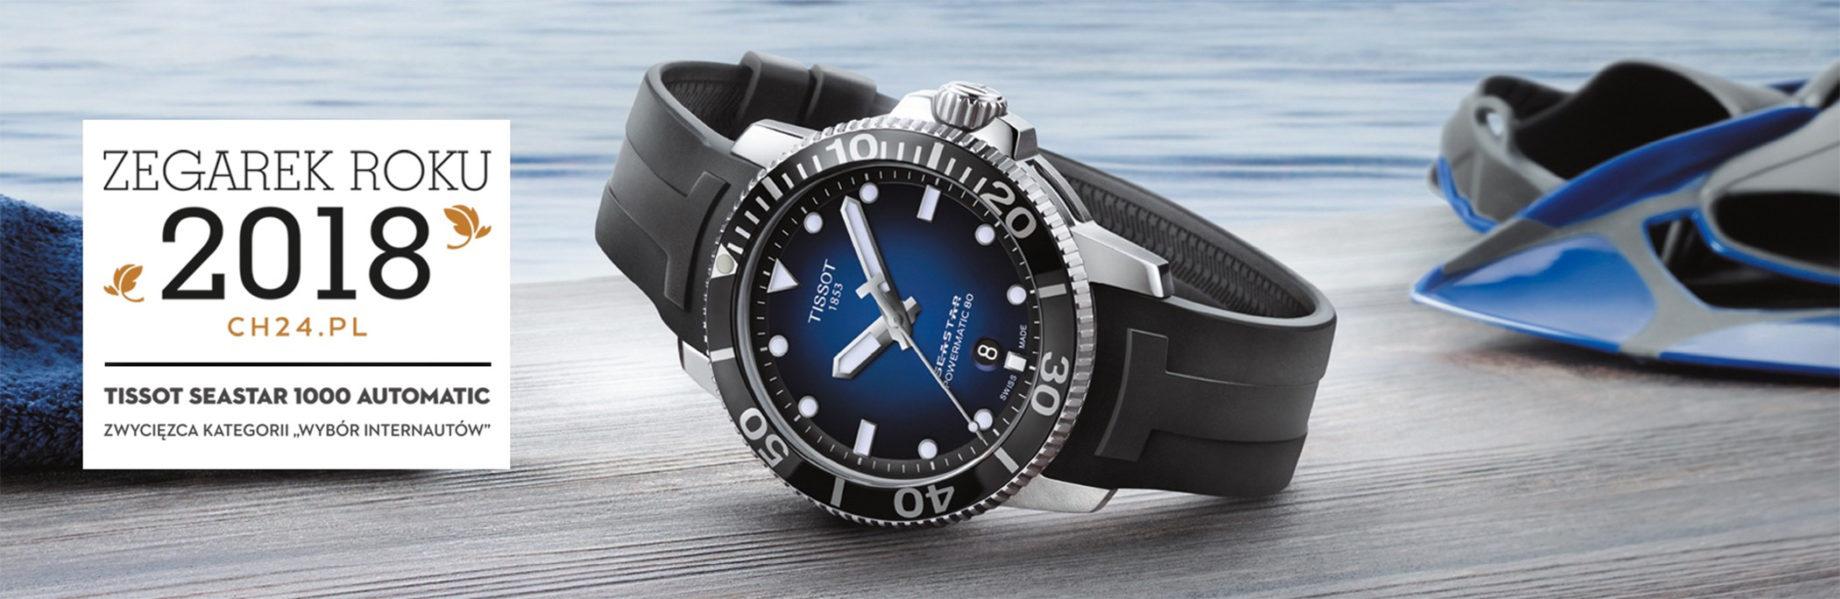 Wygraj zegarek Tissot Seastar 1000 - konkurs